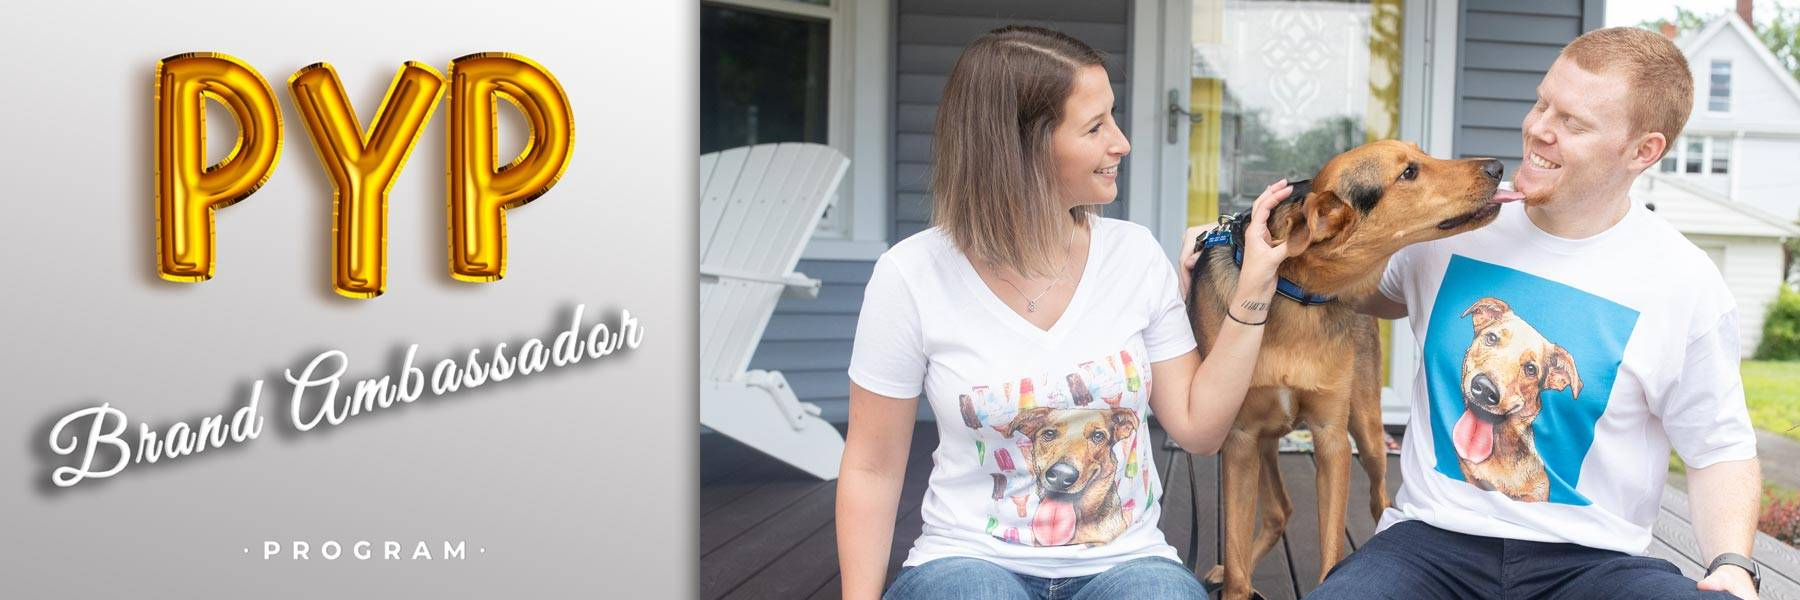 pop your pup ambassador program image